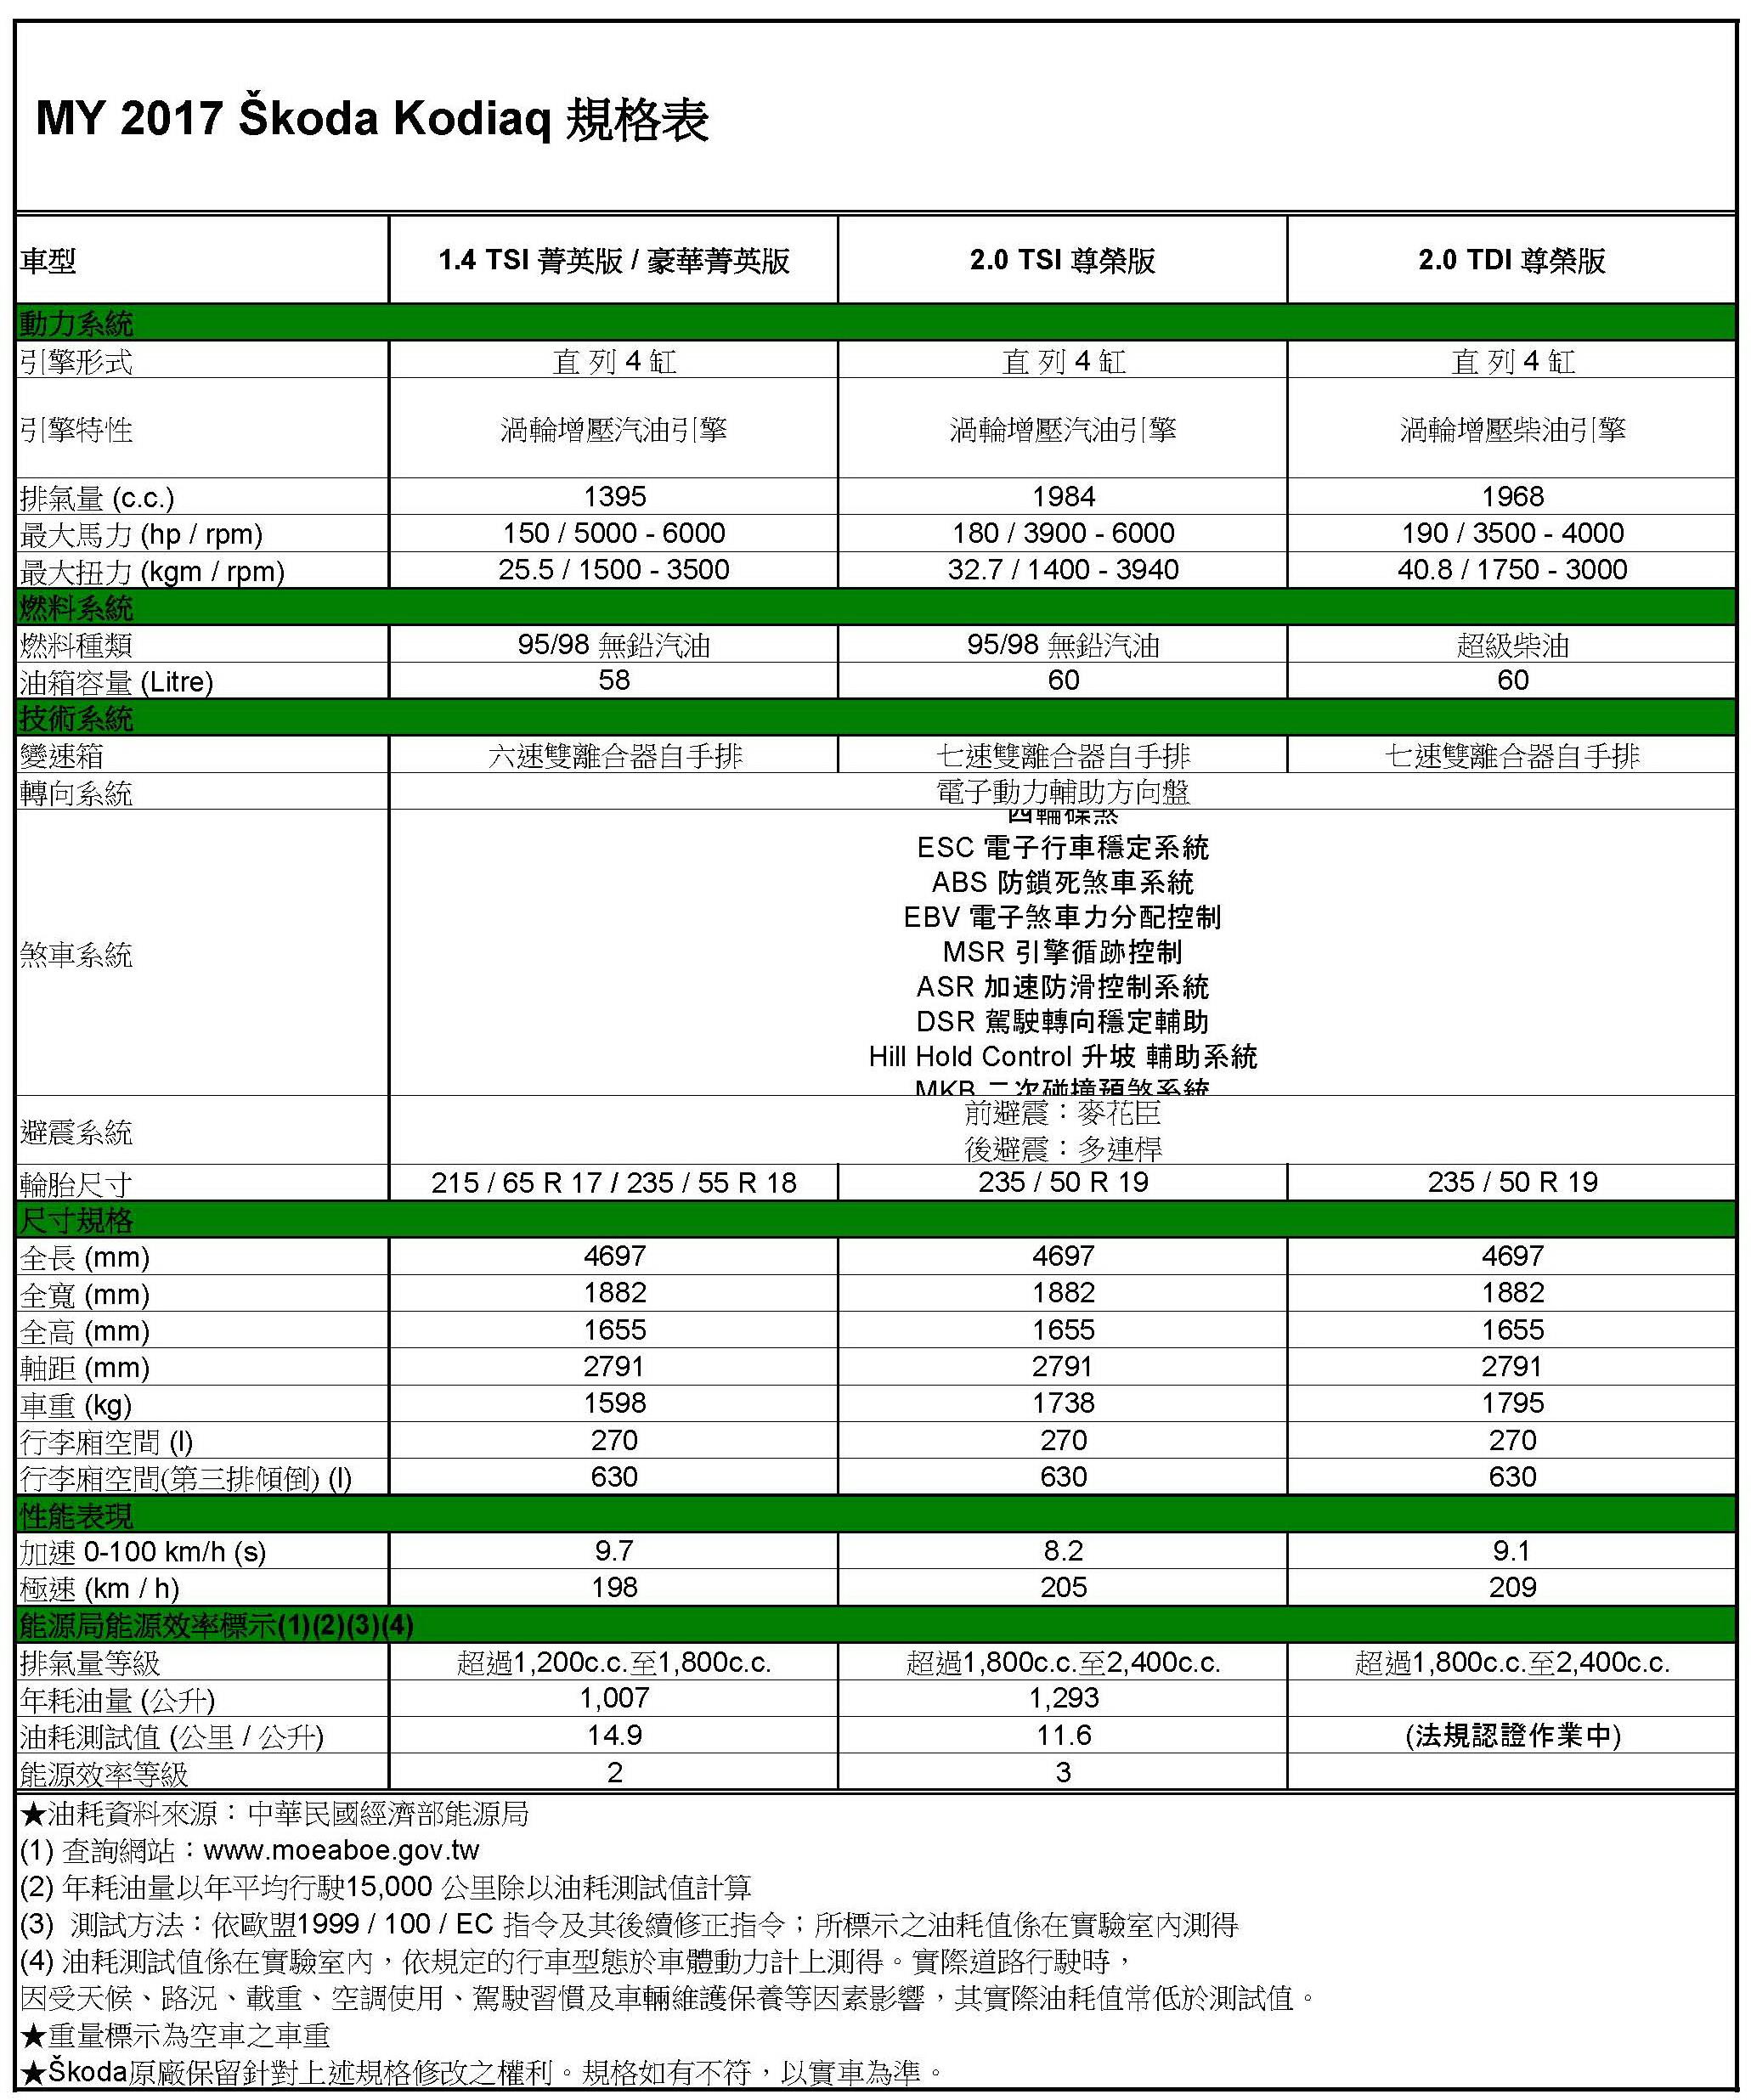 MY17 Skoda Kodiaq全車系規格配備表_頁面_1